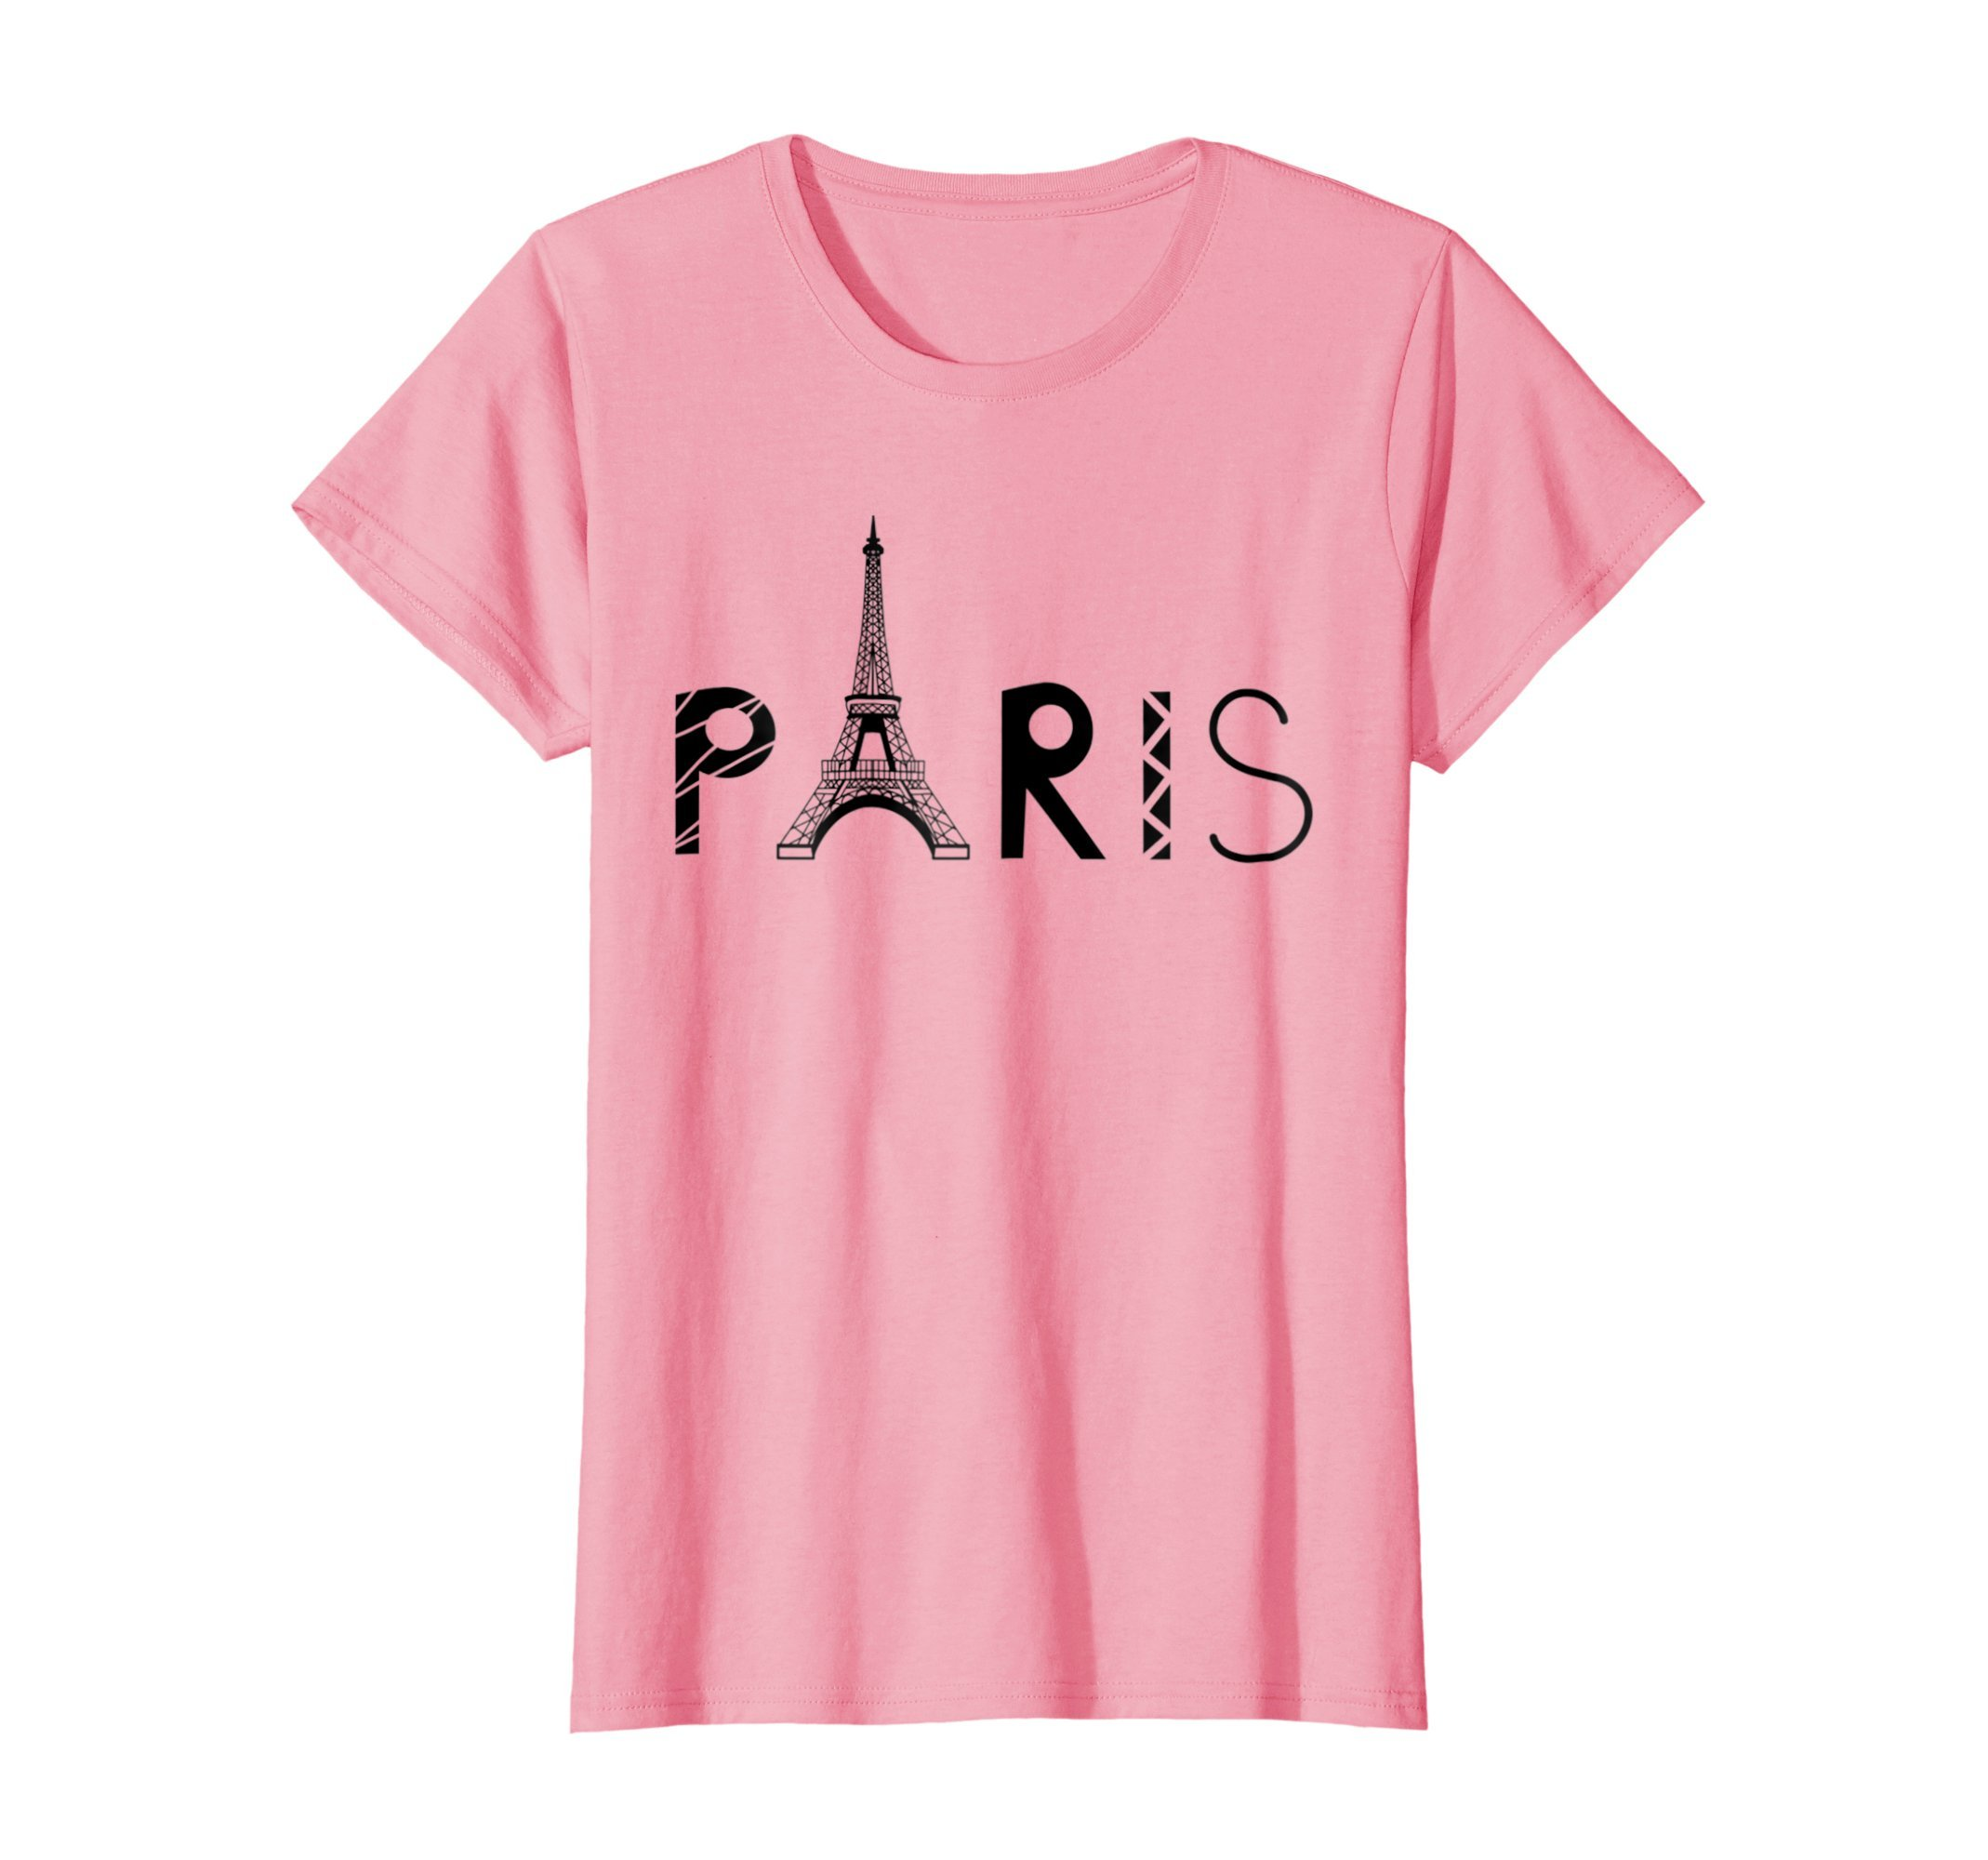 Womens Vintage Paris Tshirt I Love Travel Wanderlust Eiffel Tower XL Pink